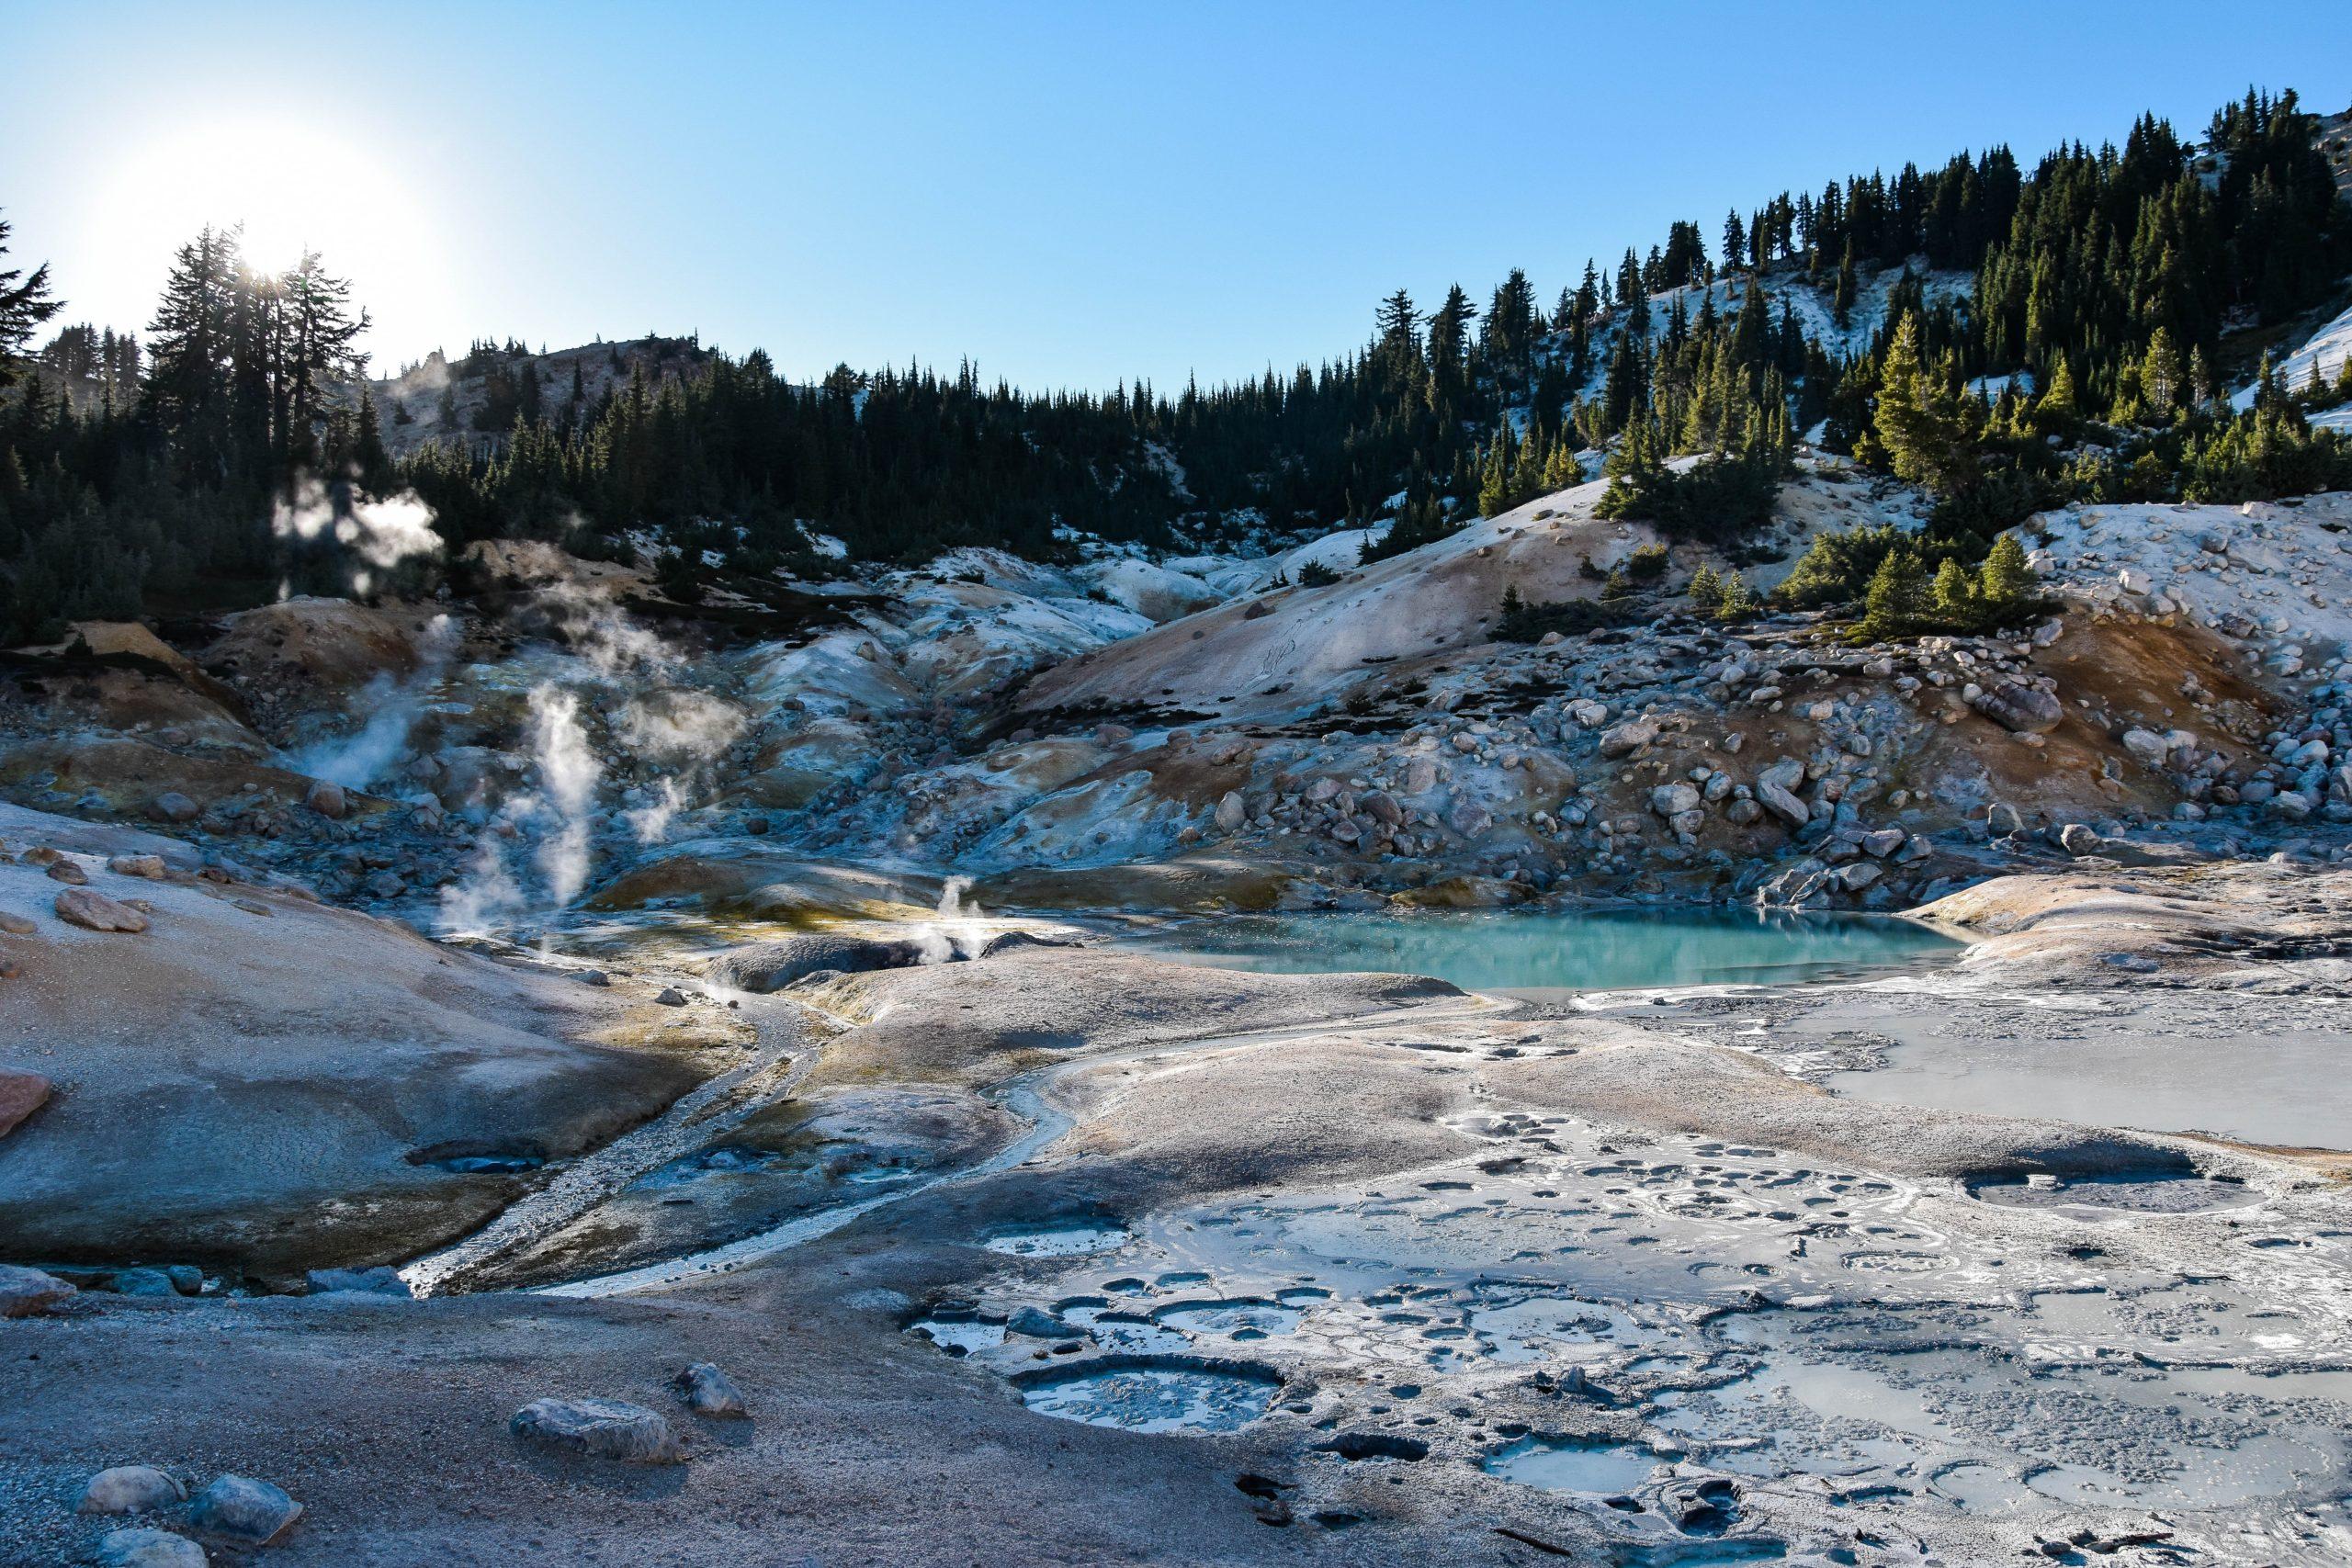 Lassen National Park - The Top 9 California National Parks | CaliQuests